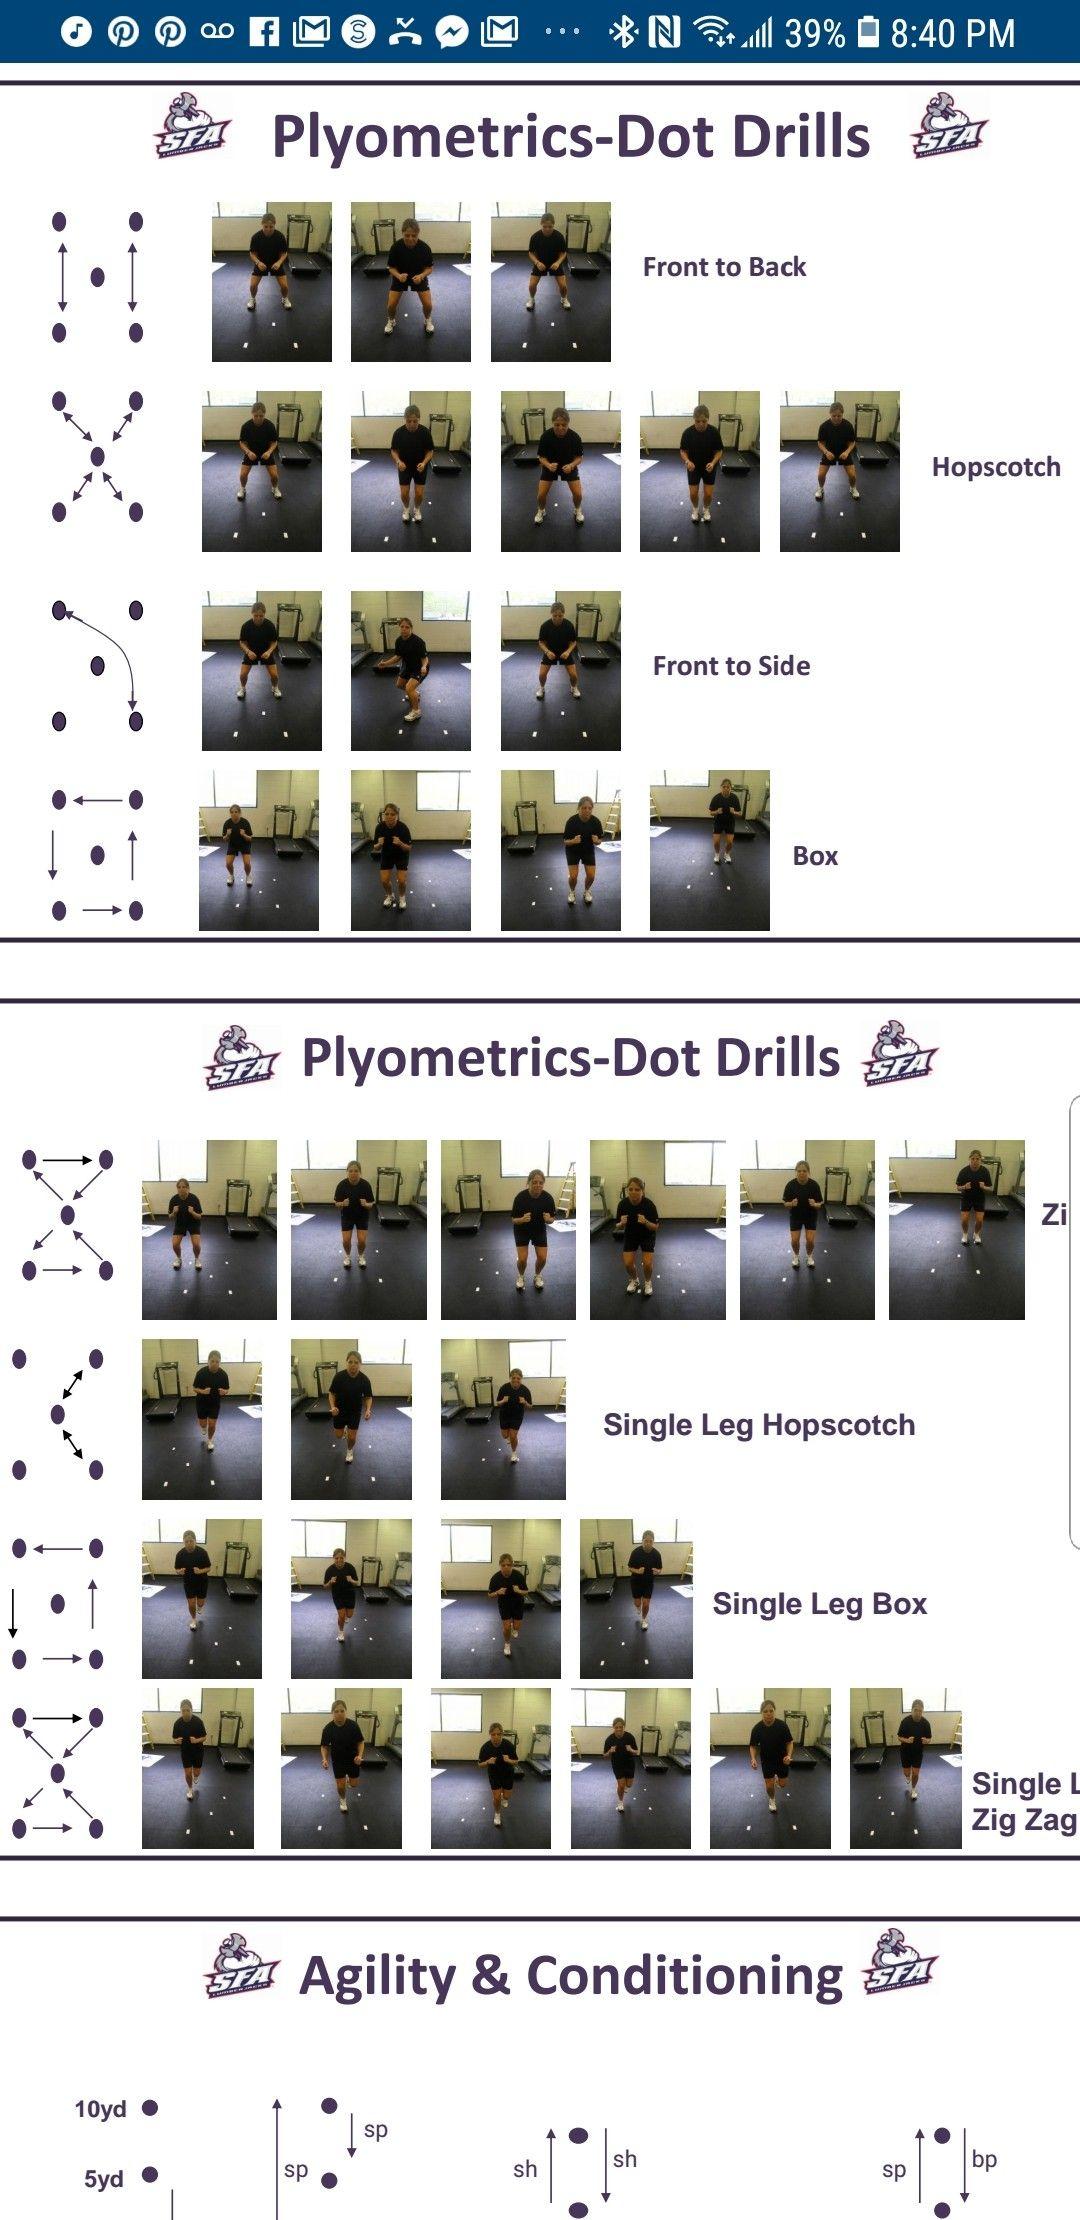 Plyometric Dot Drills Basketball Training Equipment Plyometrics Tennis Workout